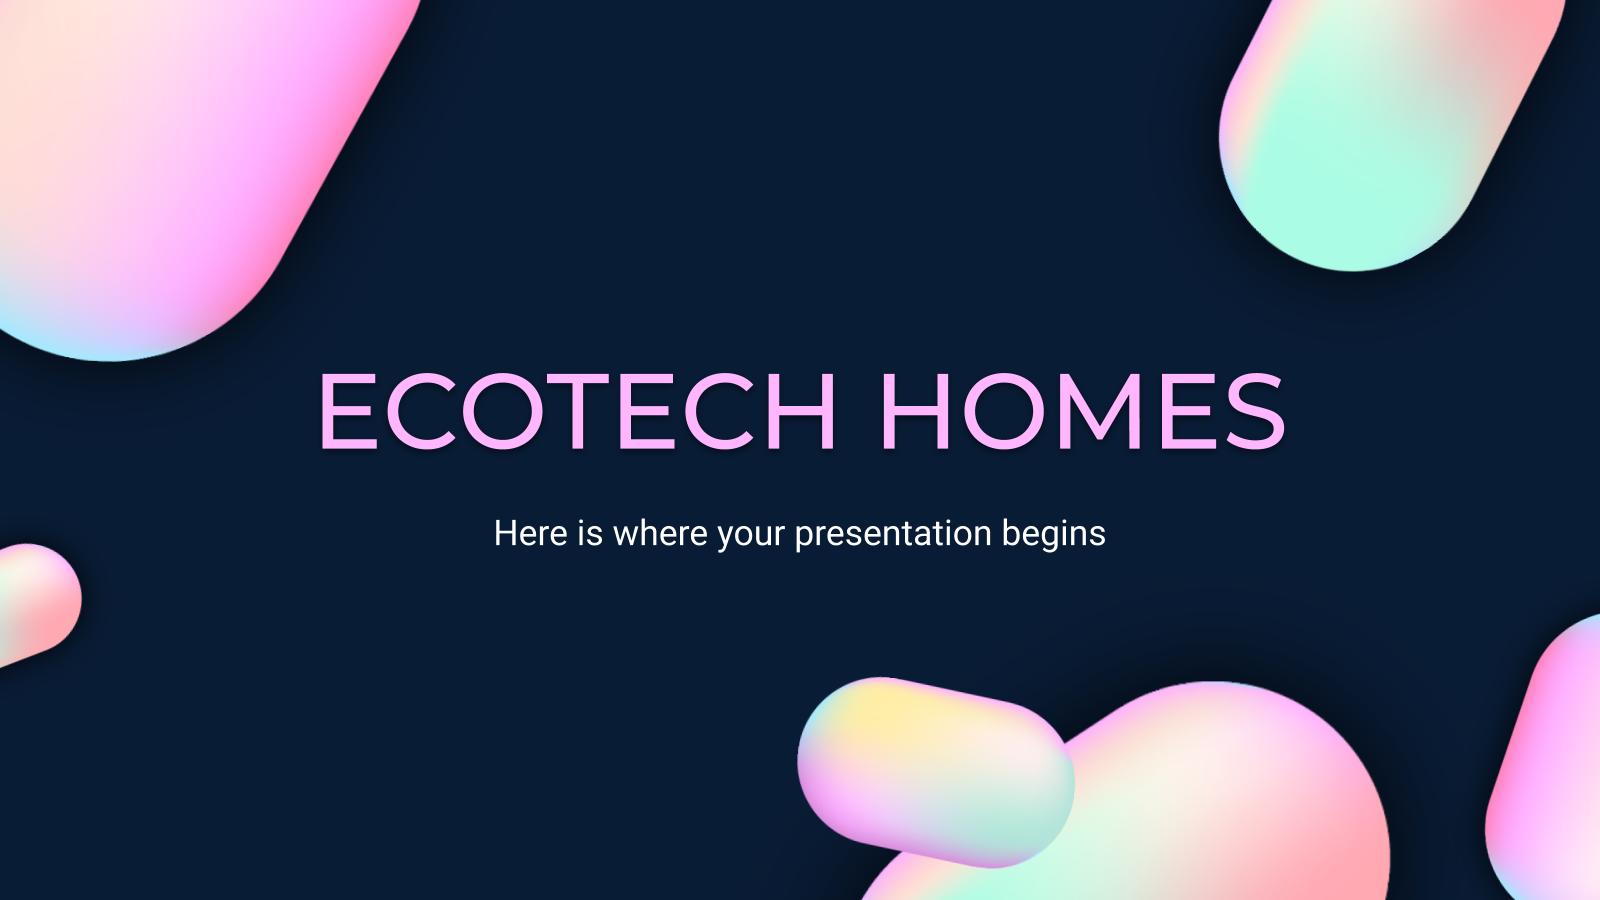 Ecotech Homes presentation template